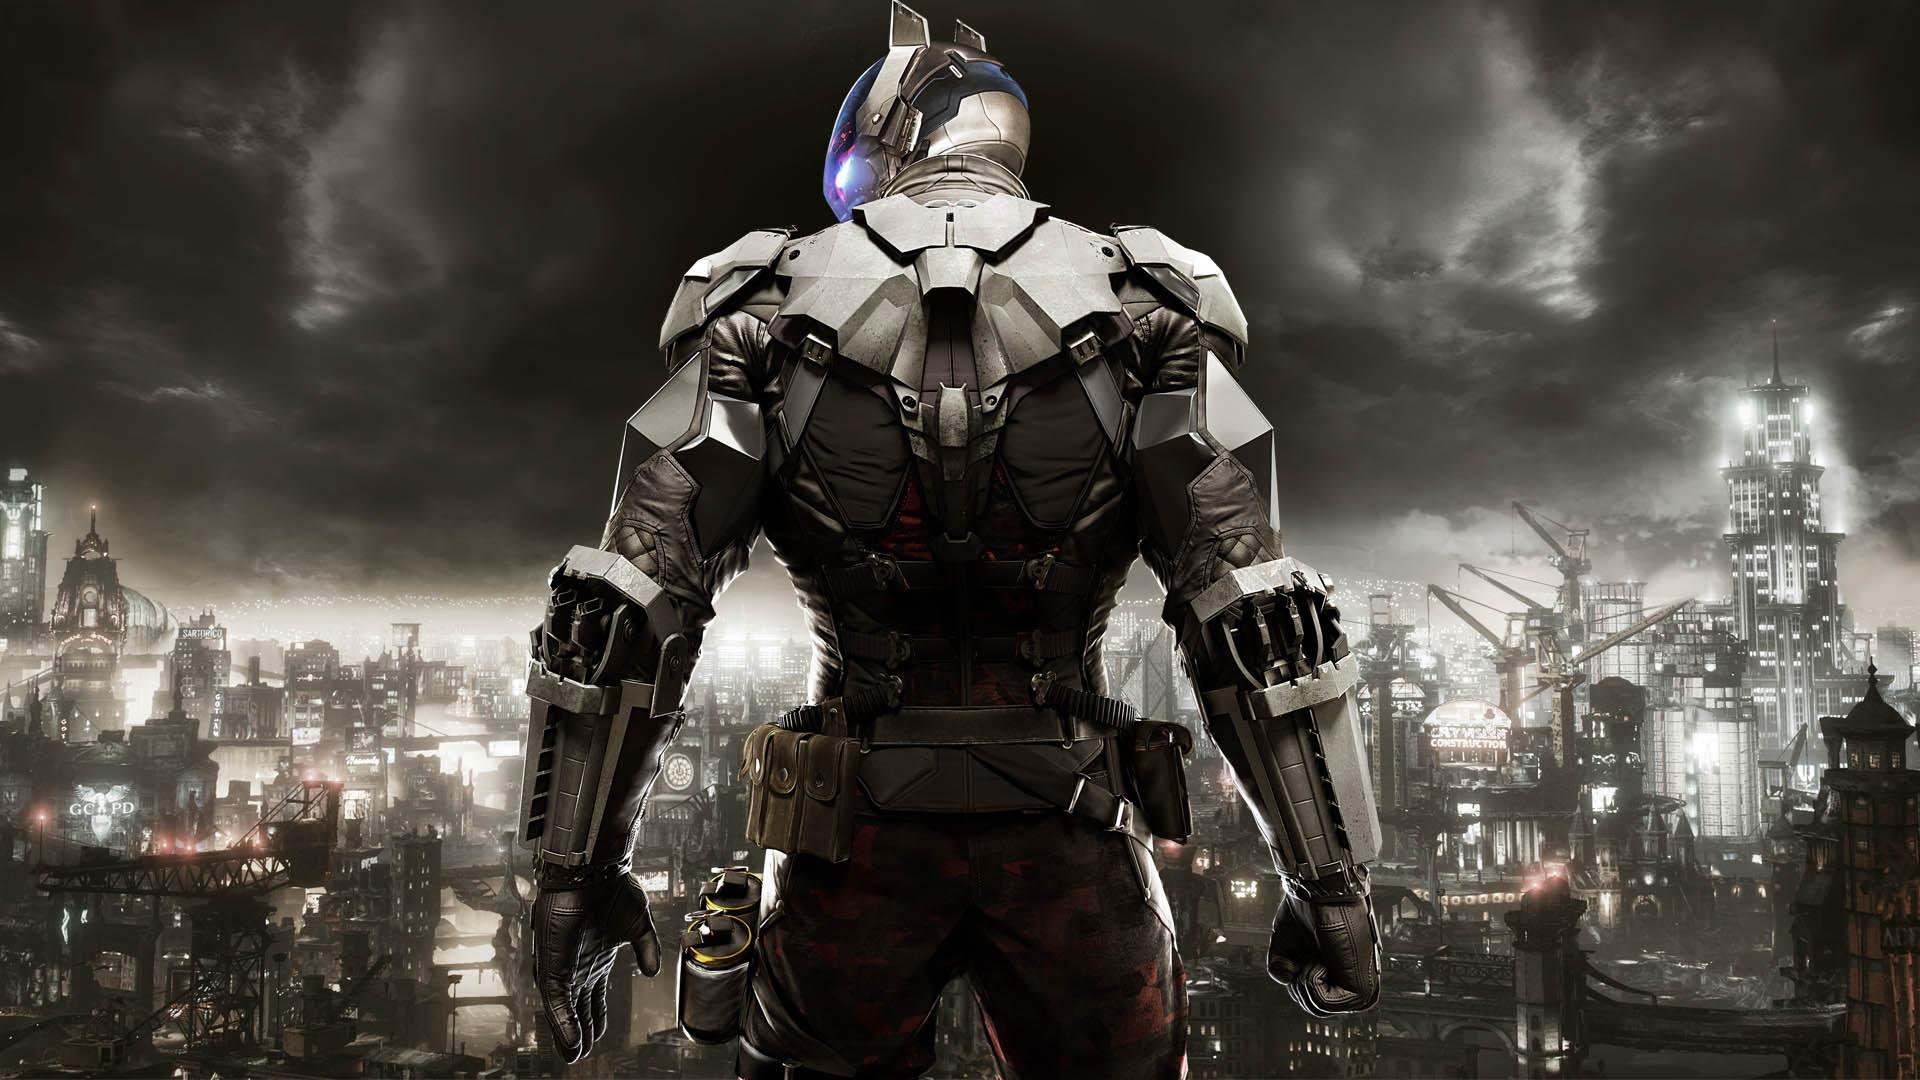 Batman: Arkham Knight, Villain, Armor, Soldier, Darkness wallpaper ...